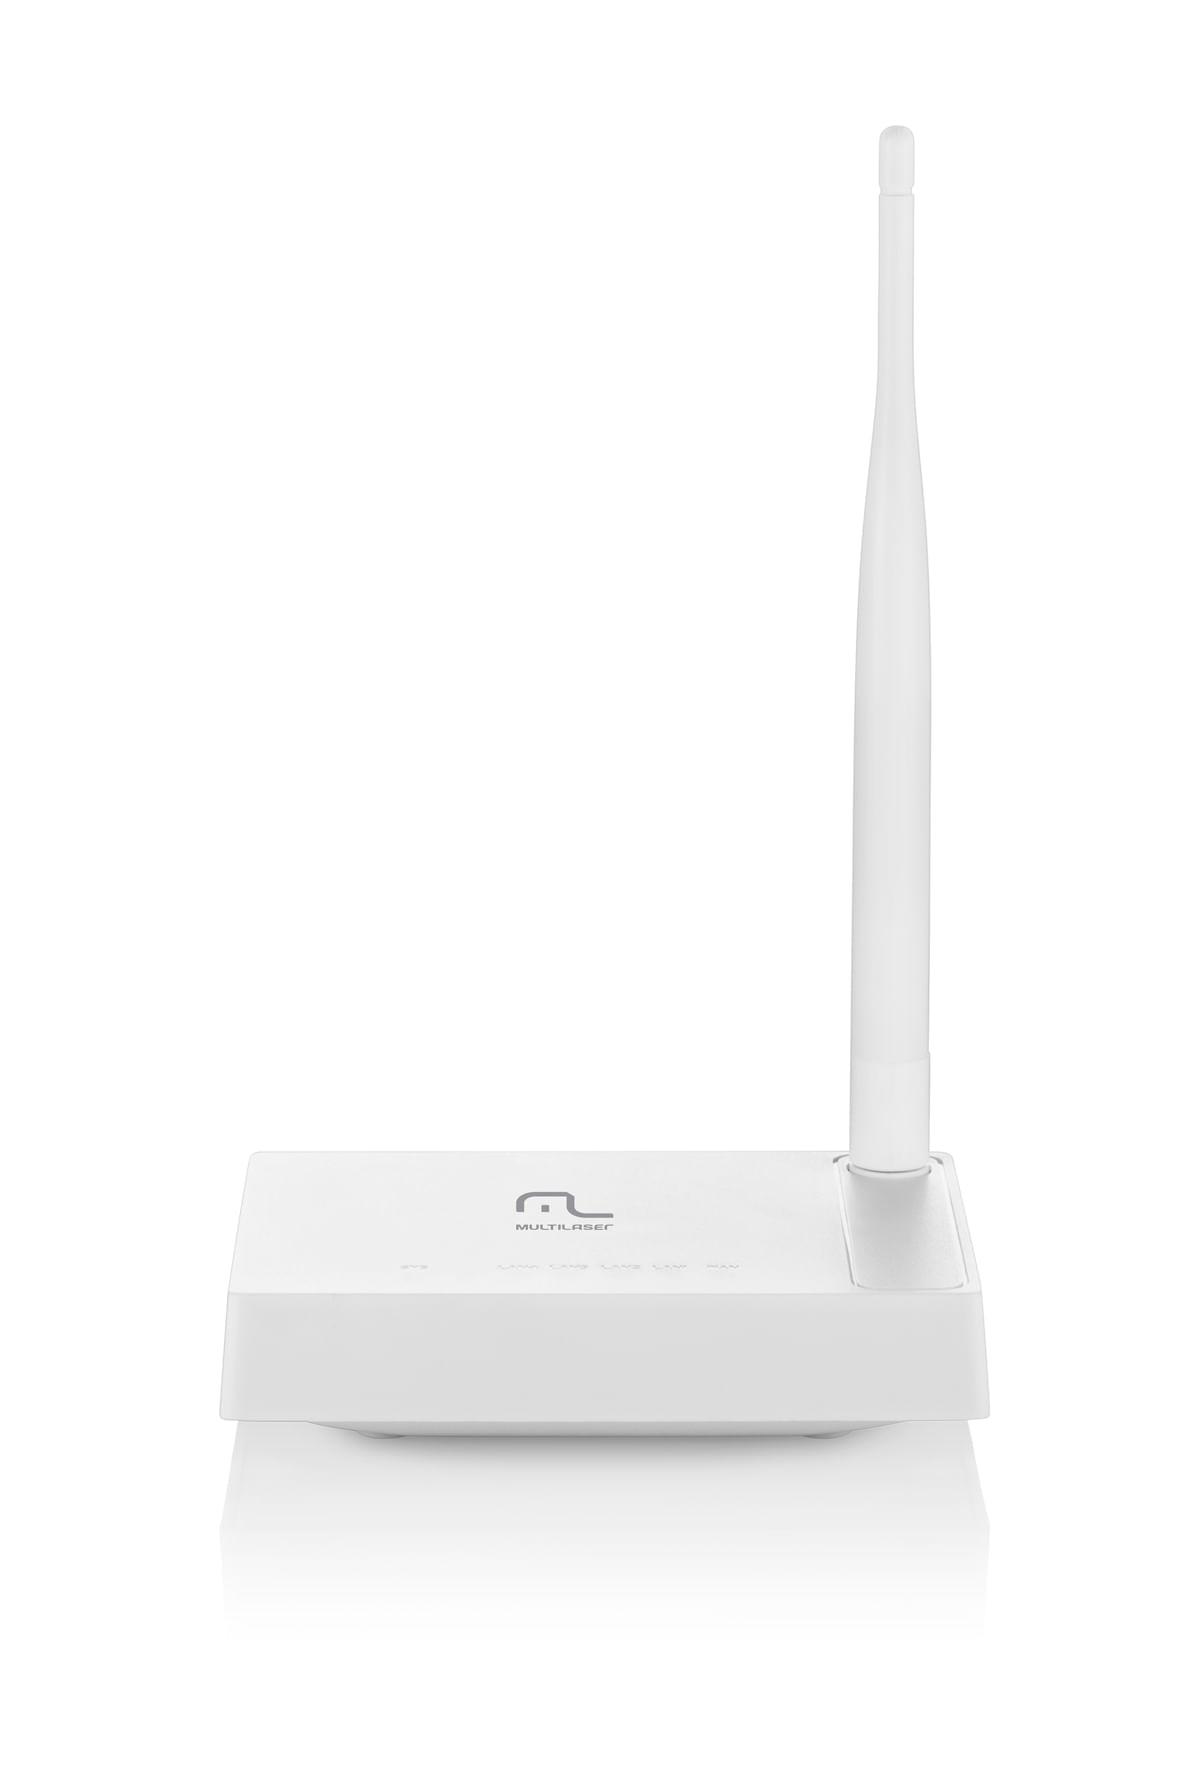 Foto 1 - Roteador Wireless 150Mbps 1 Antena Fixa 4 Portas Lan Multilaser RE057